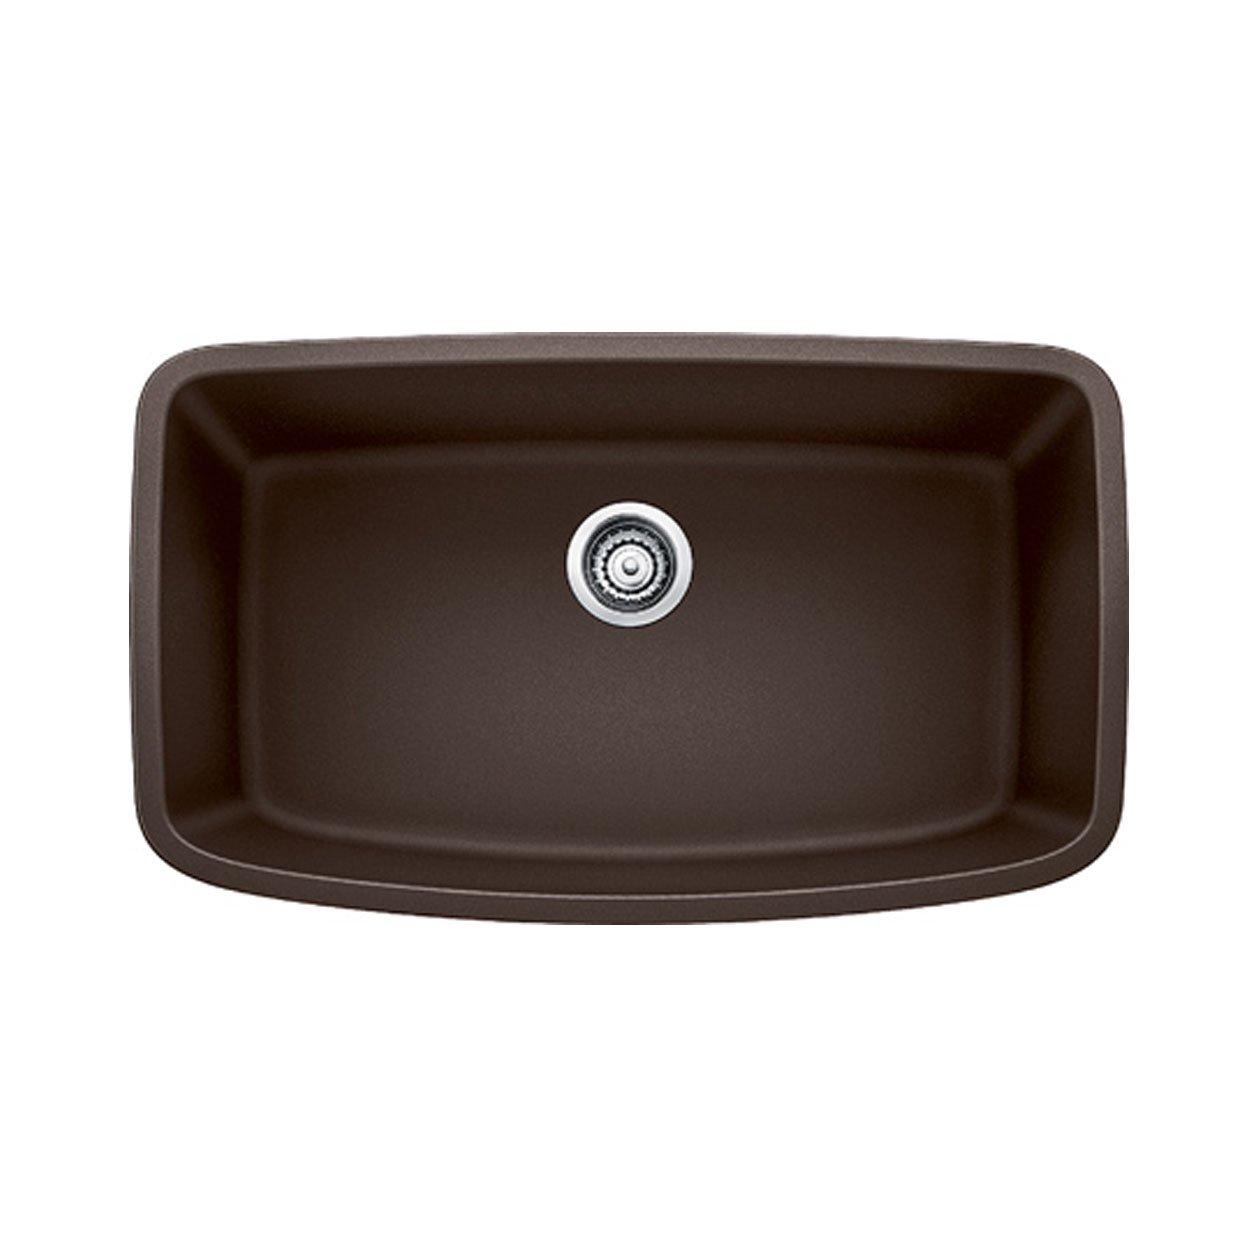 Blanco 441613 Valea Super Undermount Single Bowl Kitchen Sink, Large, Cafe Brown